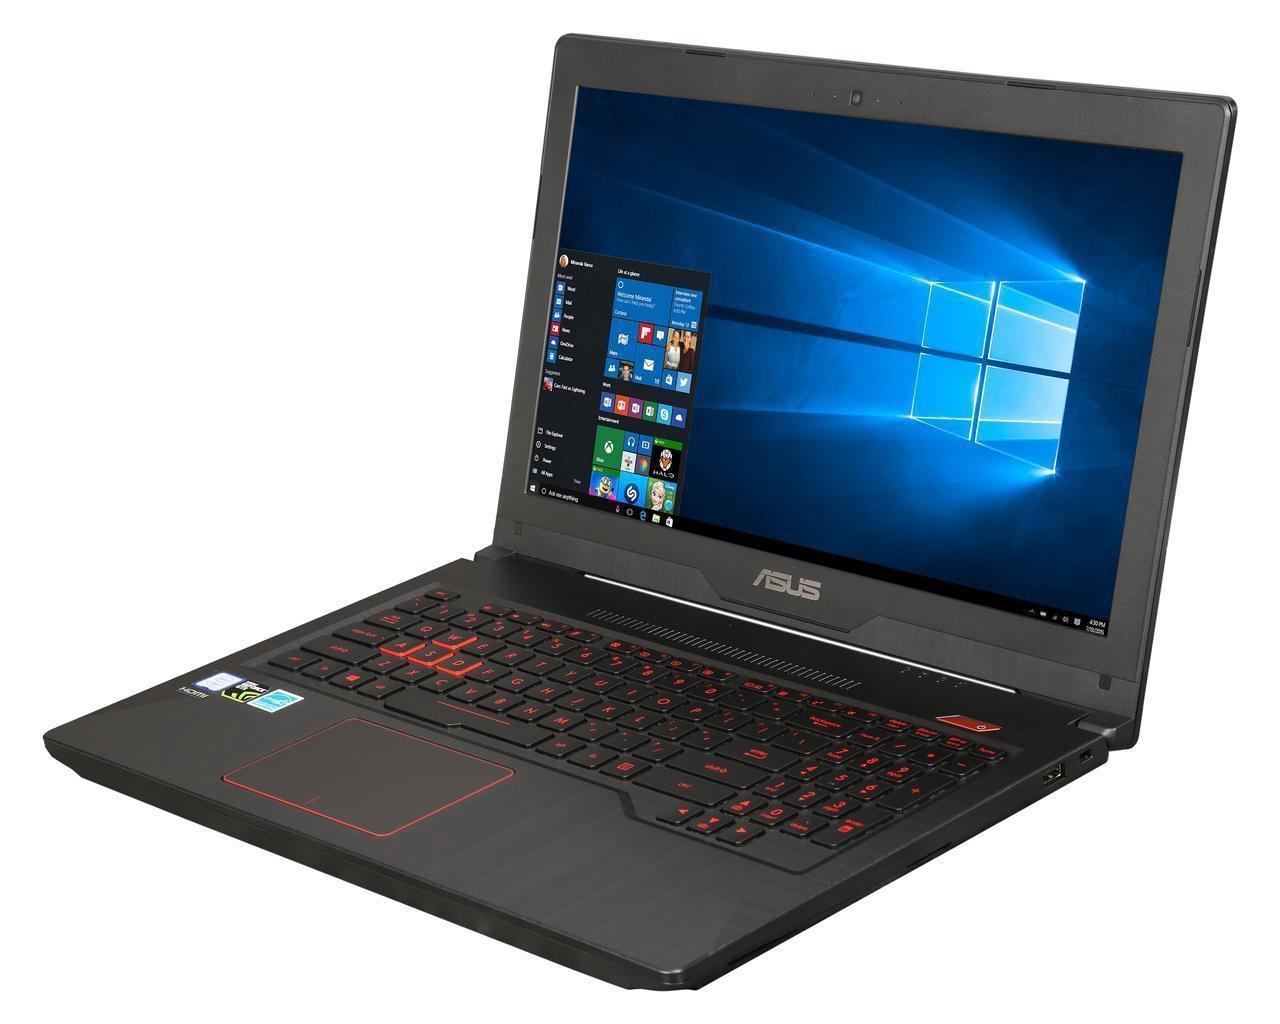 Игровой ноутбук БУ 15.6 (1920x1080)  Intel Core 7-7700hq (4x2.8GHz)  Geforce GeForce 1050, 4GB RAM 8GB HDD 1TB БУ